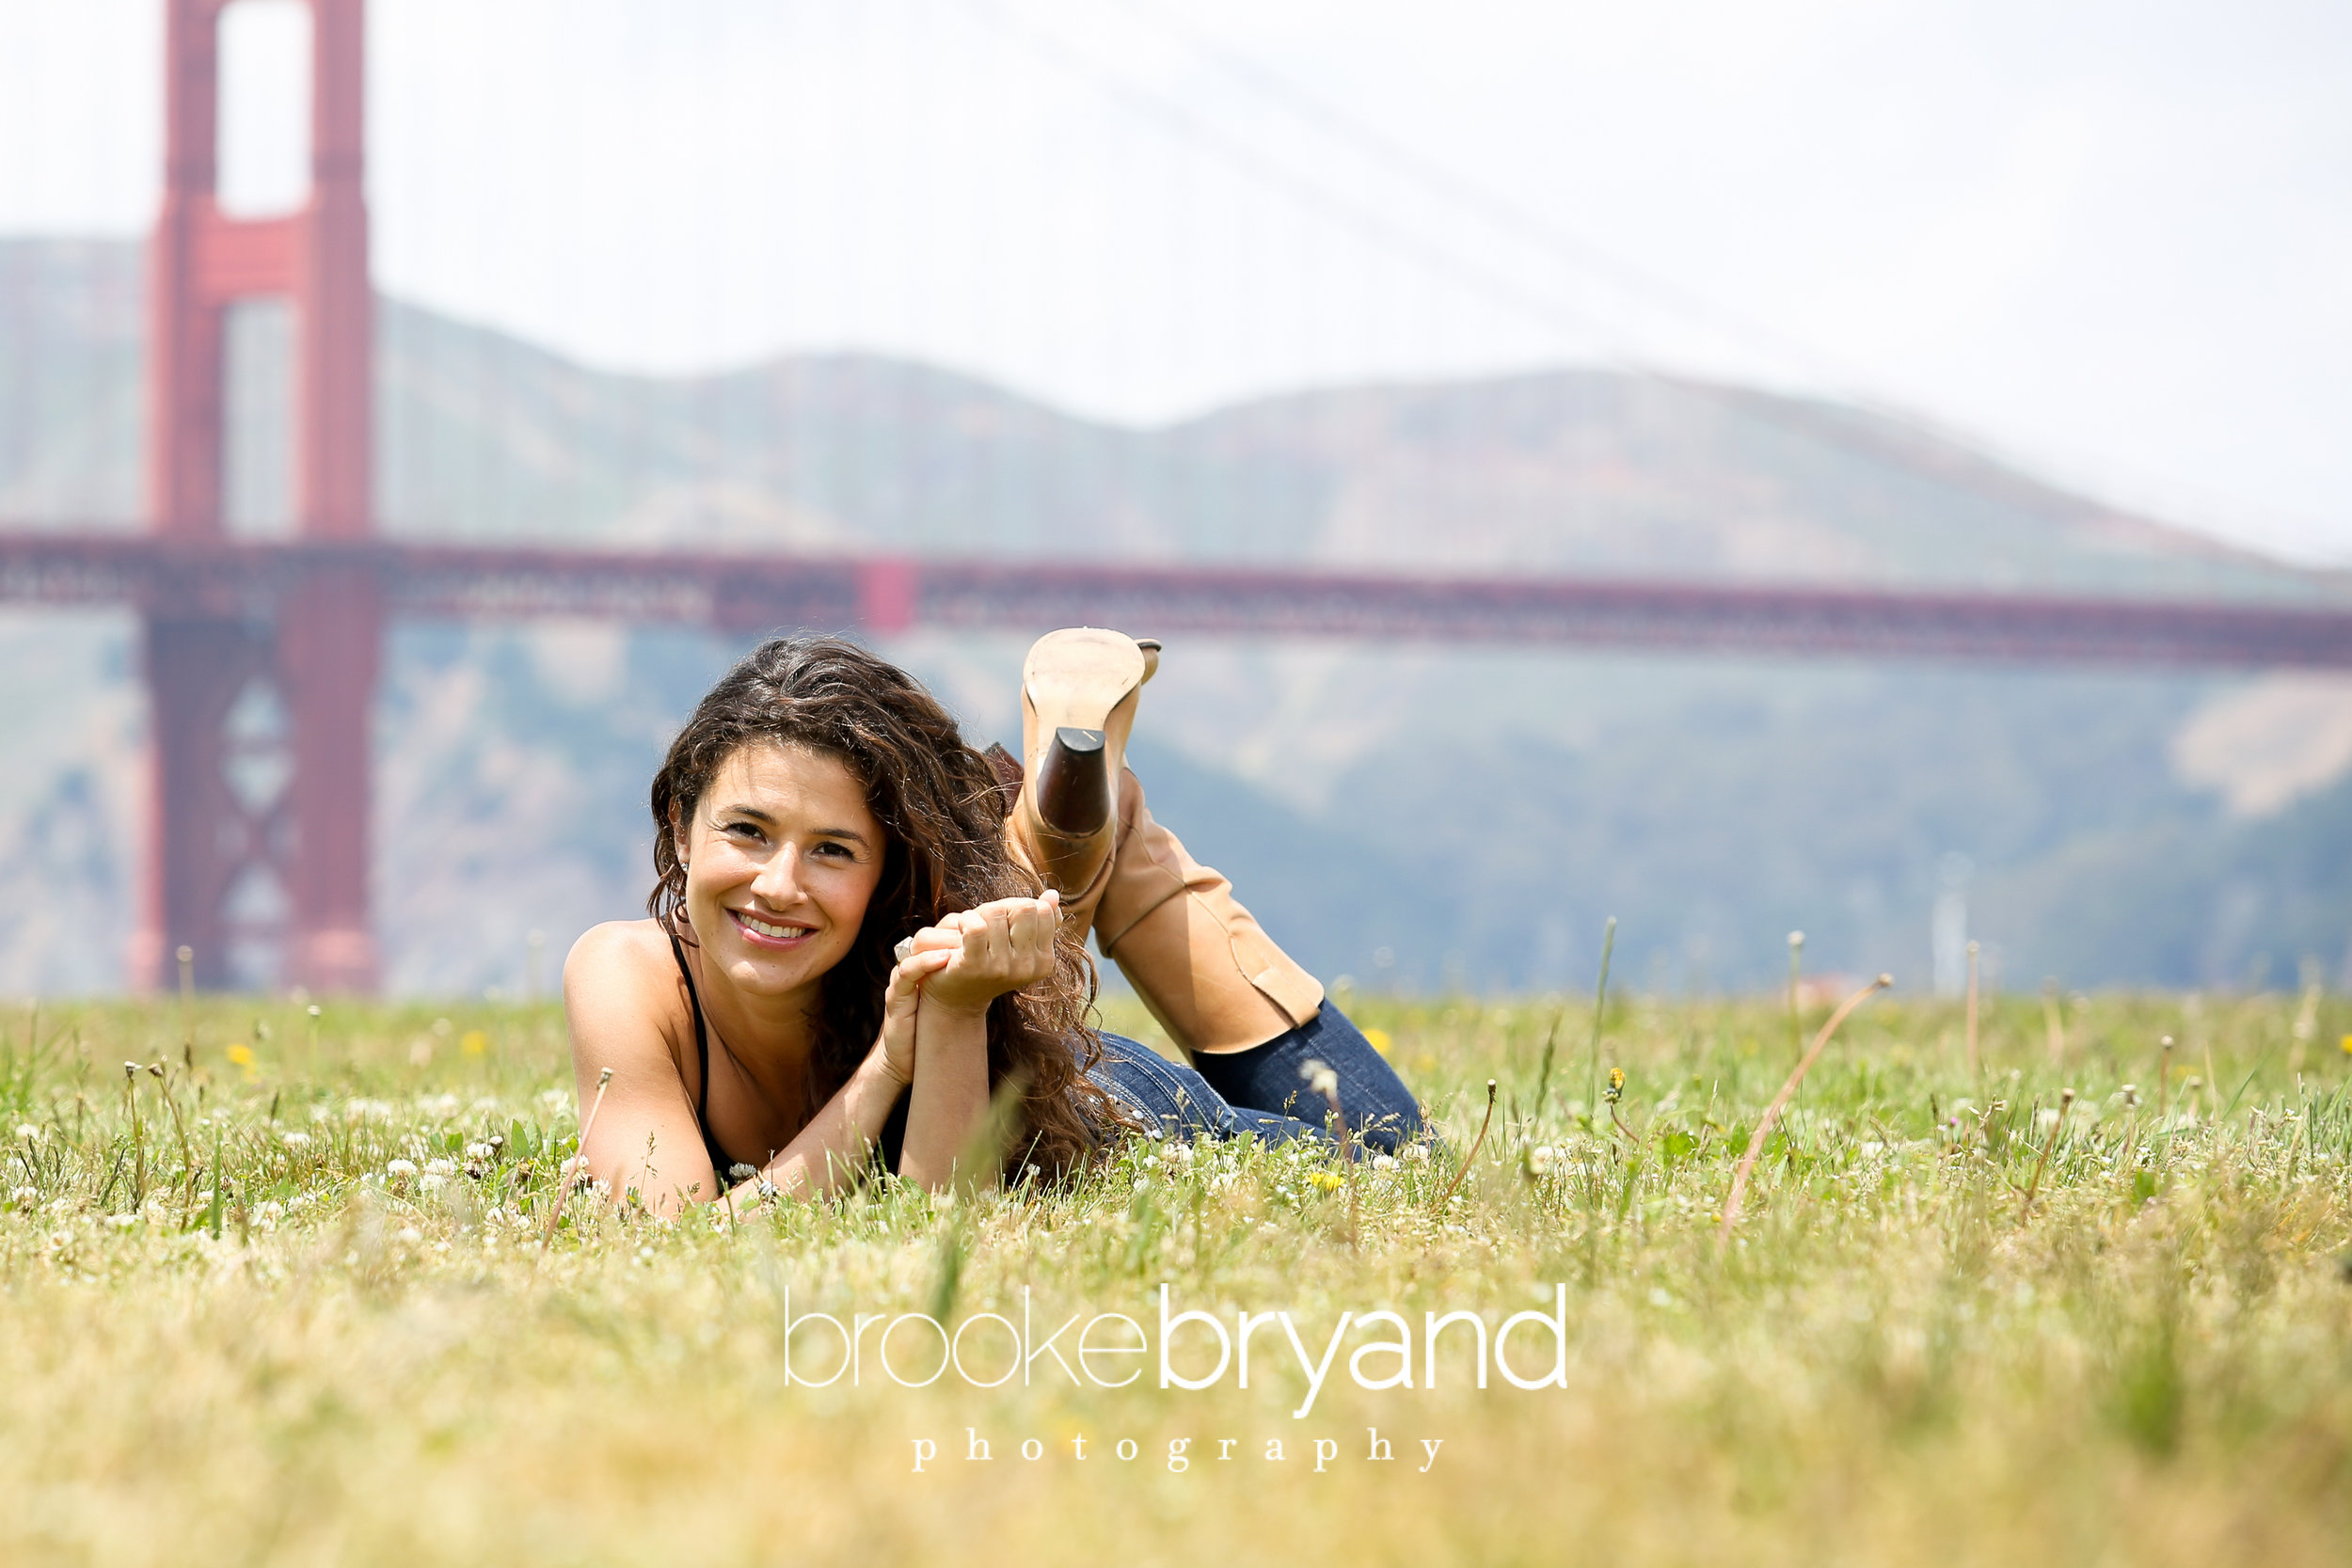 Brooke-Bryand-Photography-Crissy-Field-Golden-Gate-Bridge-IMG_1013.jpg